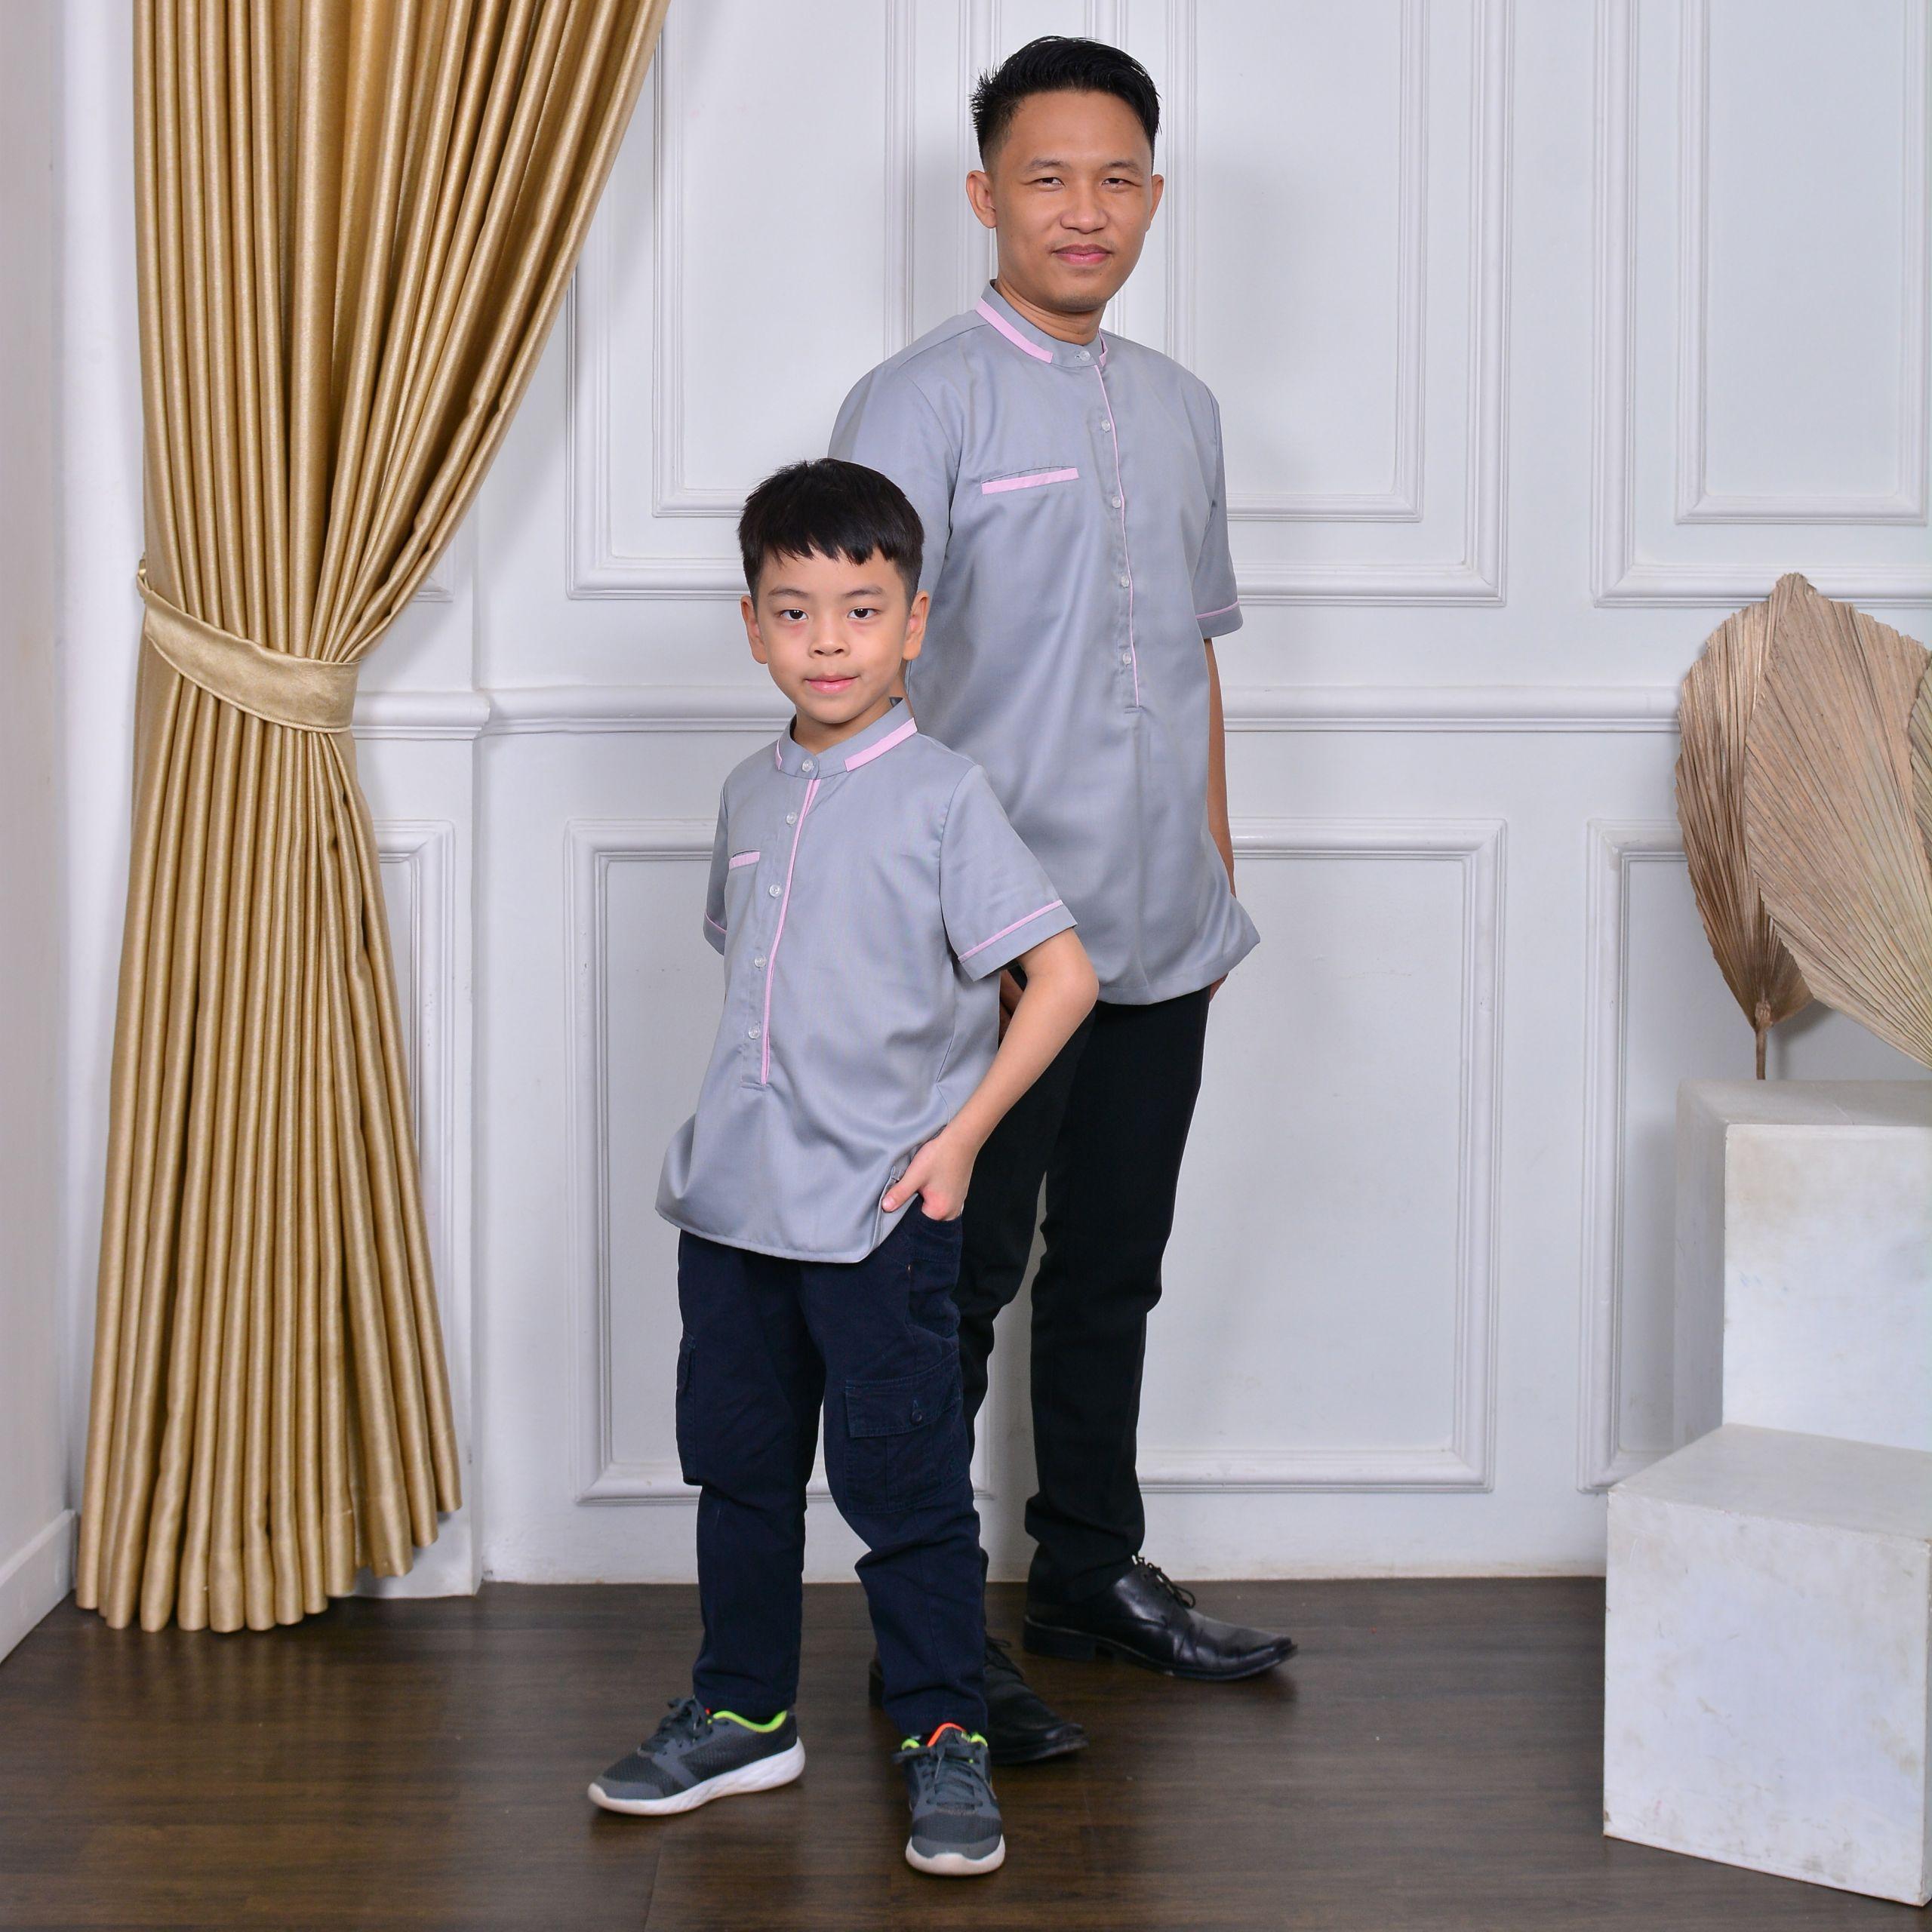 Design Baju Lebaran Dewasa Ftd8 Sarimbit Baju Lebaran Anak Dewasa Iac Baju Koko Zahra Ayah